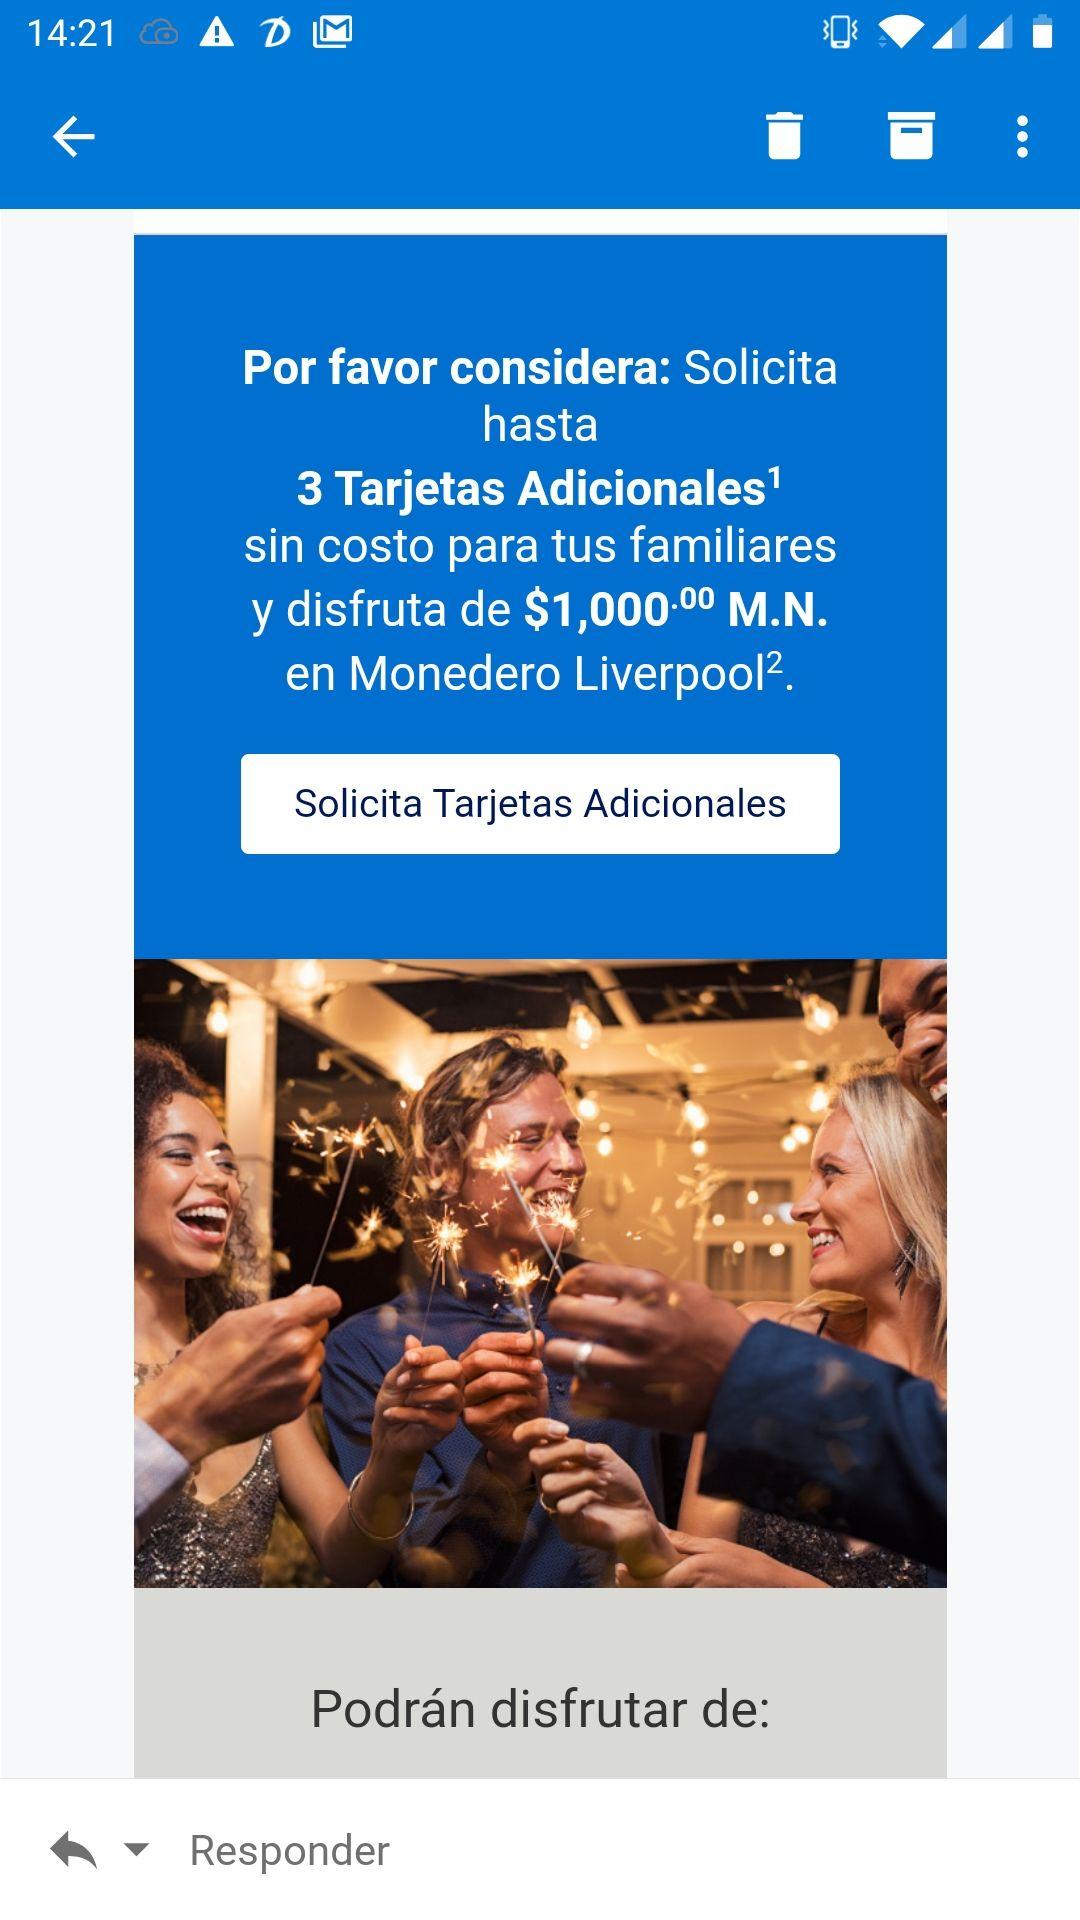 American Express: $1000 en monedero Liverpool al solicitar tarjeta adicional